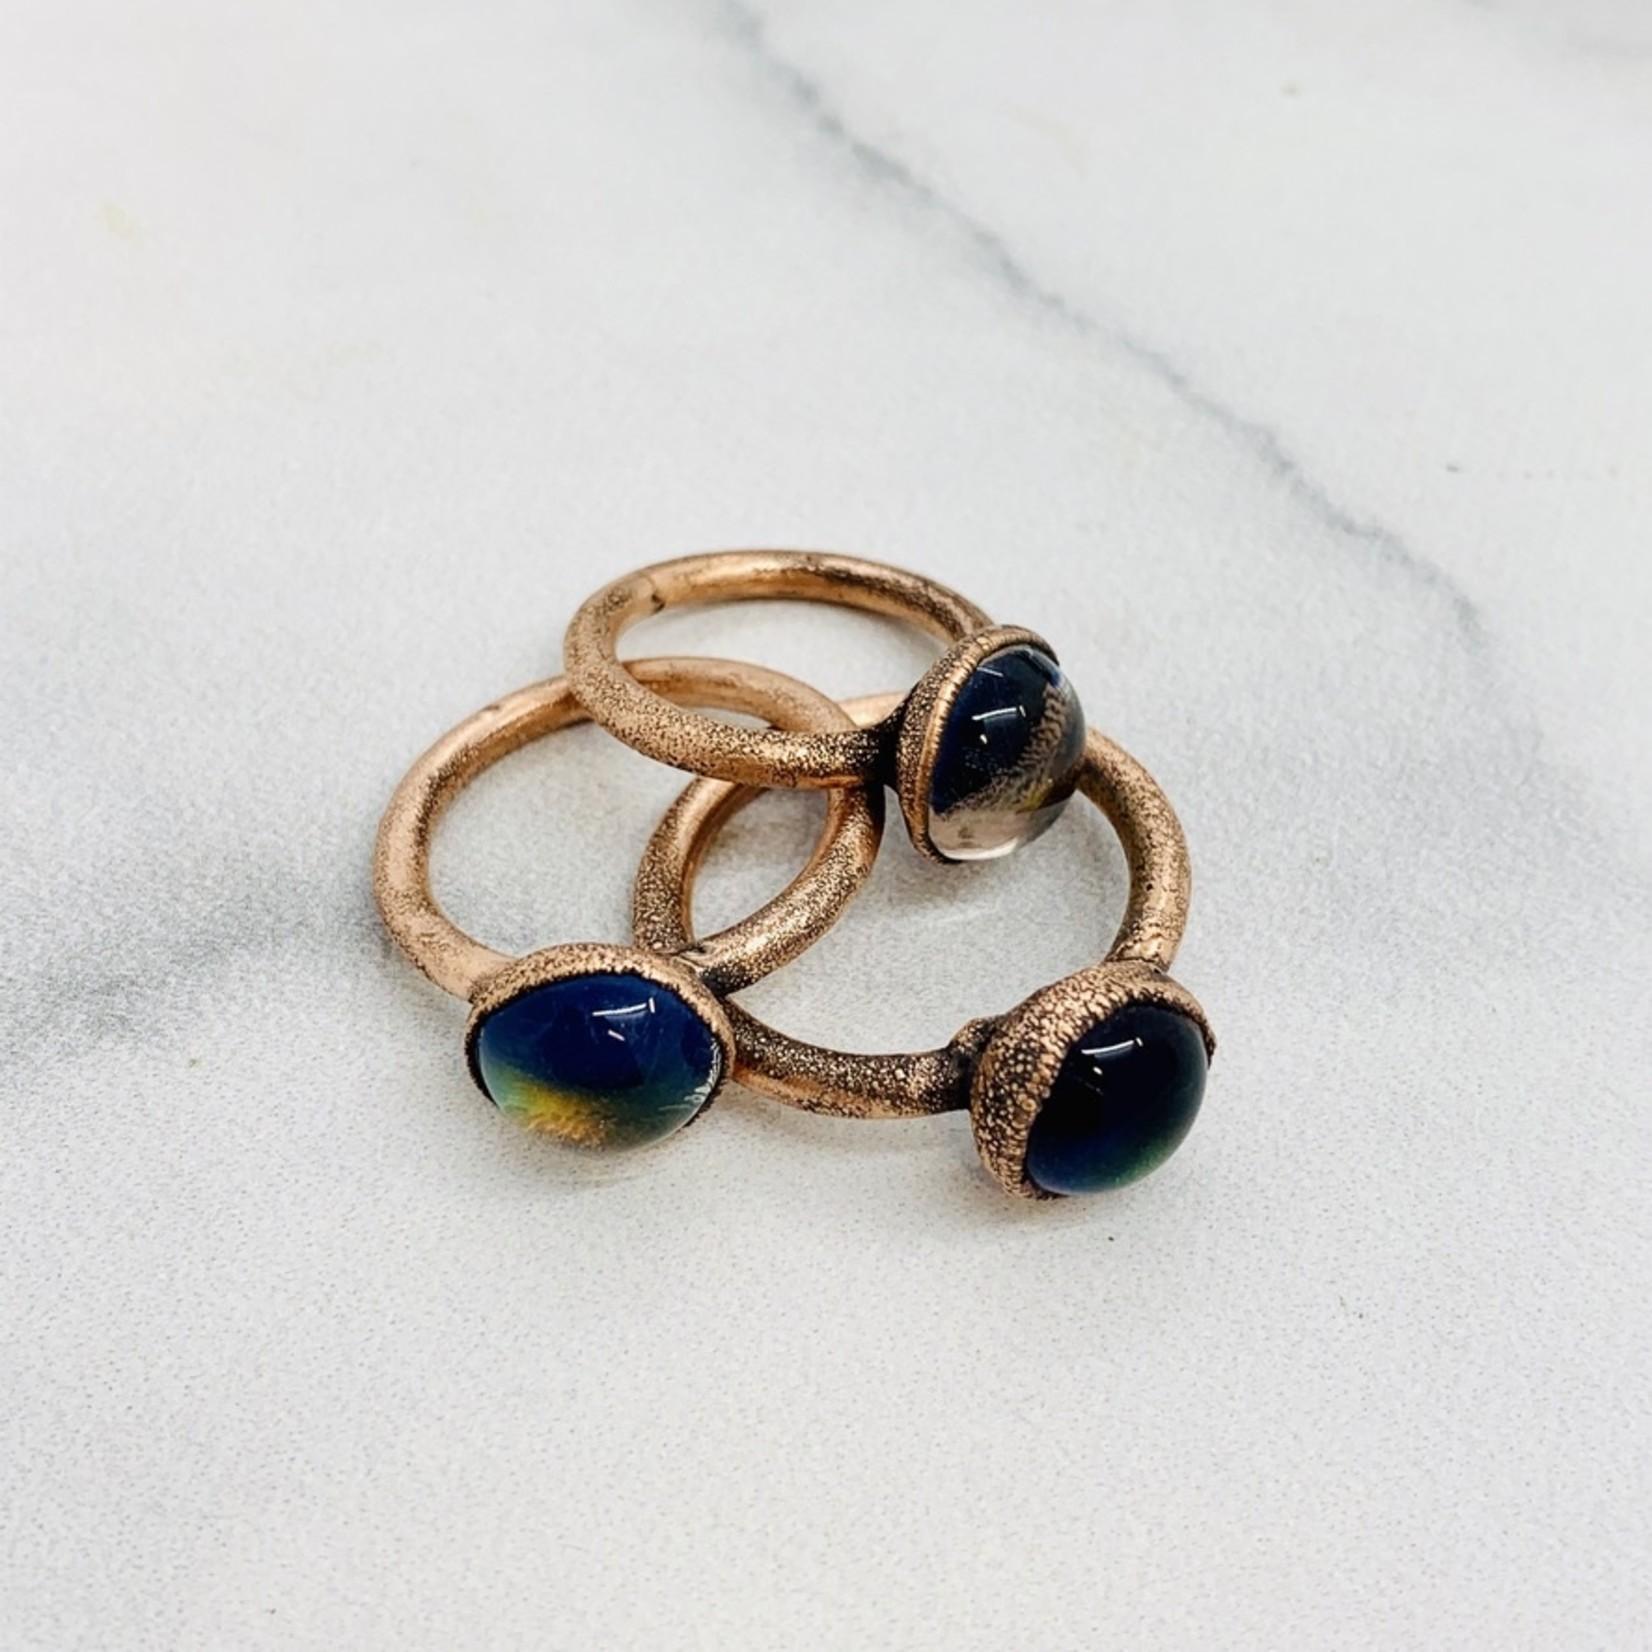 Handmade Copper Mood Ring